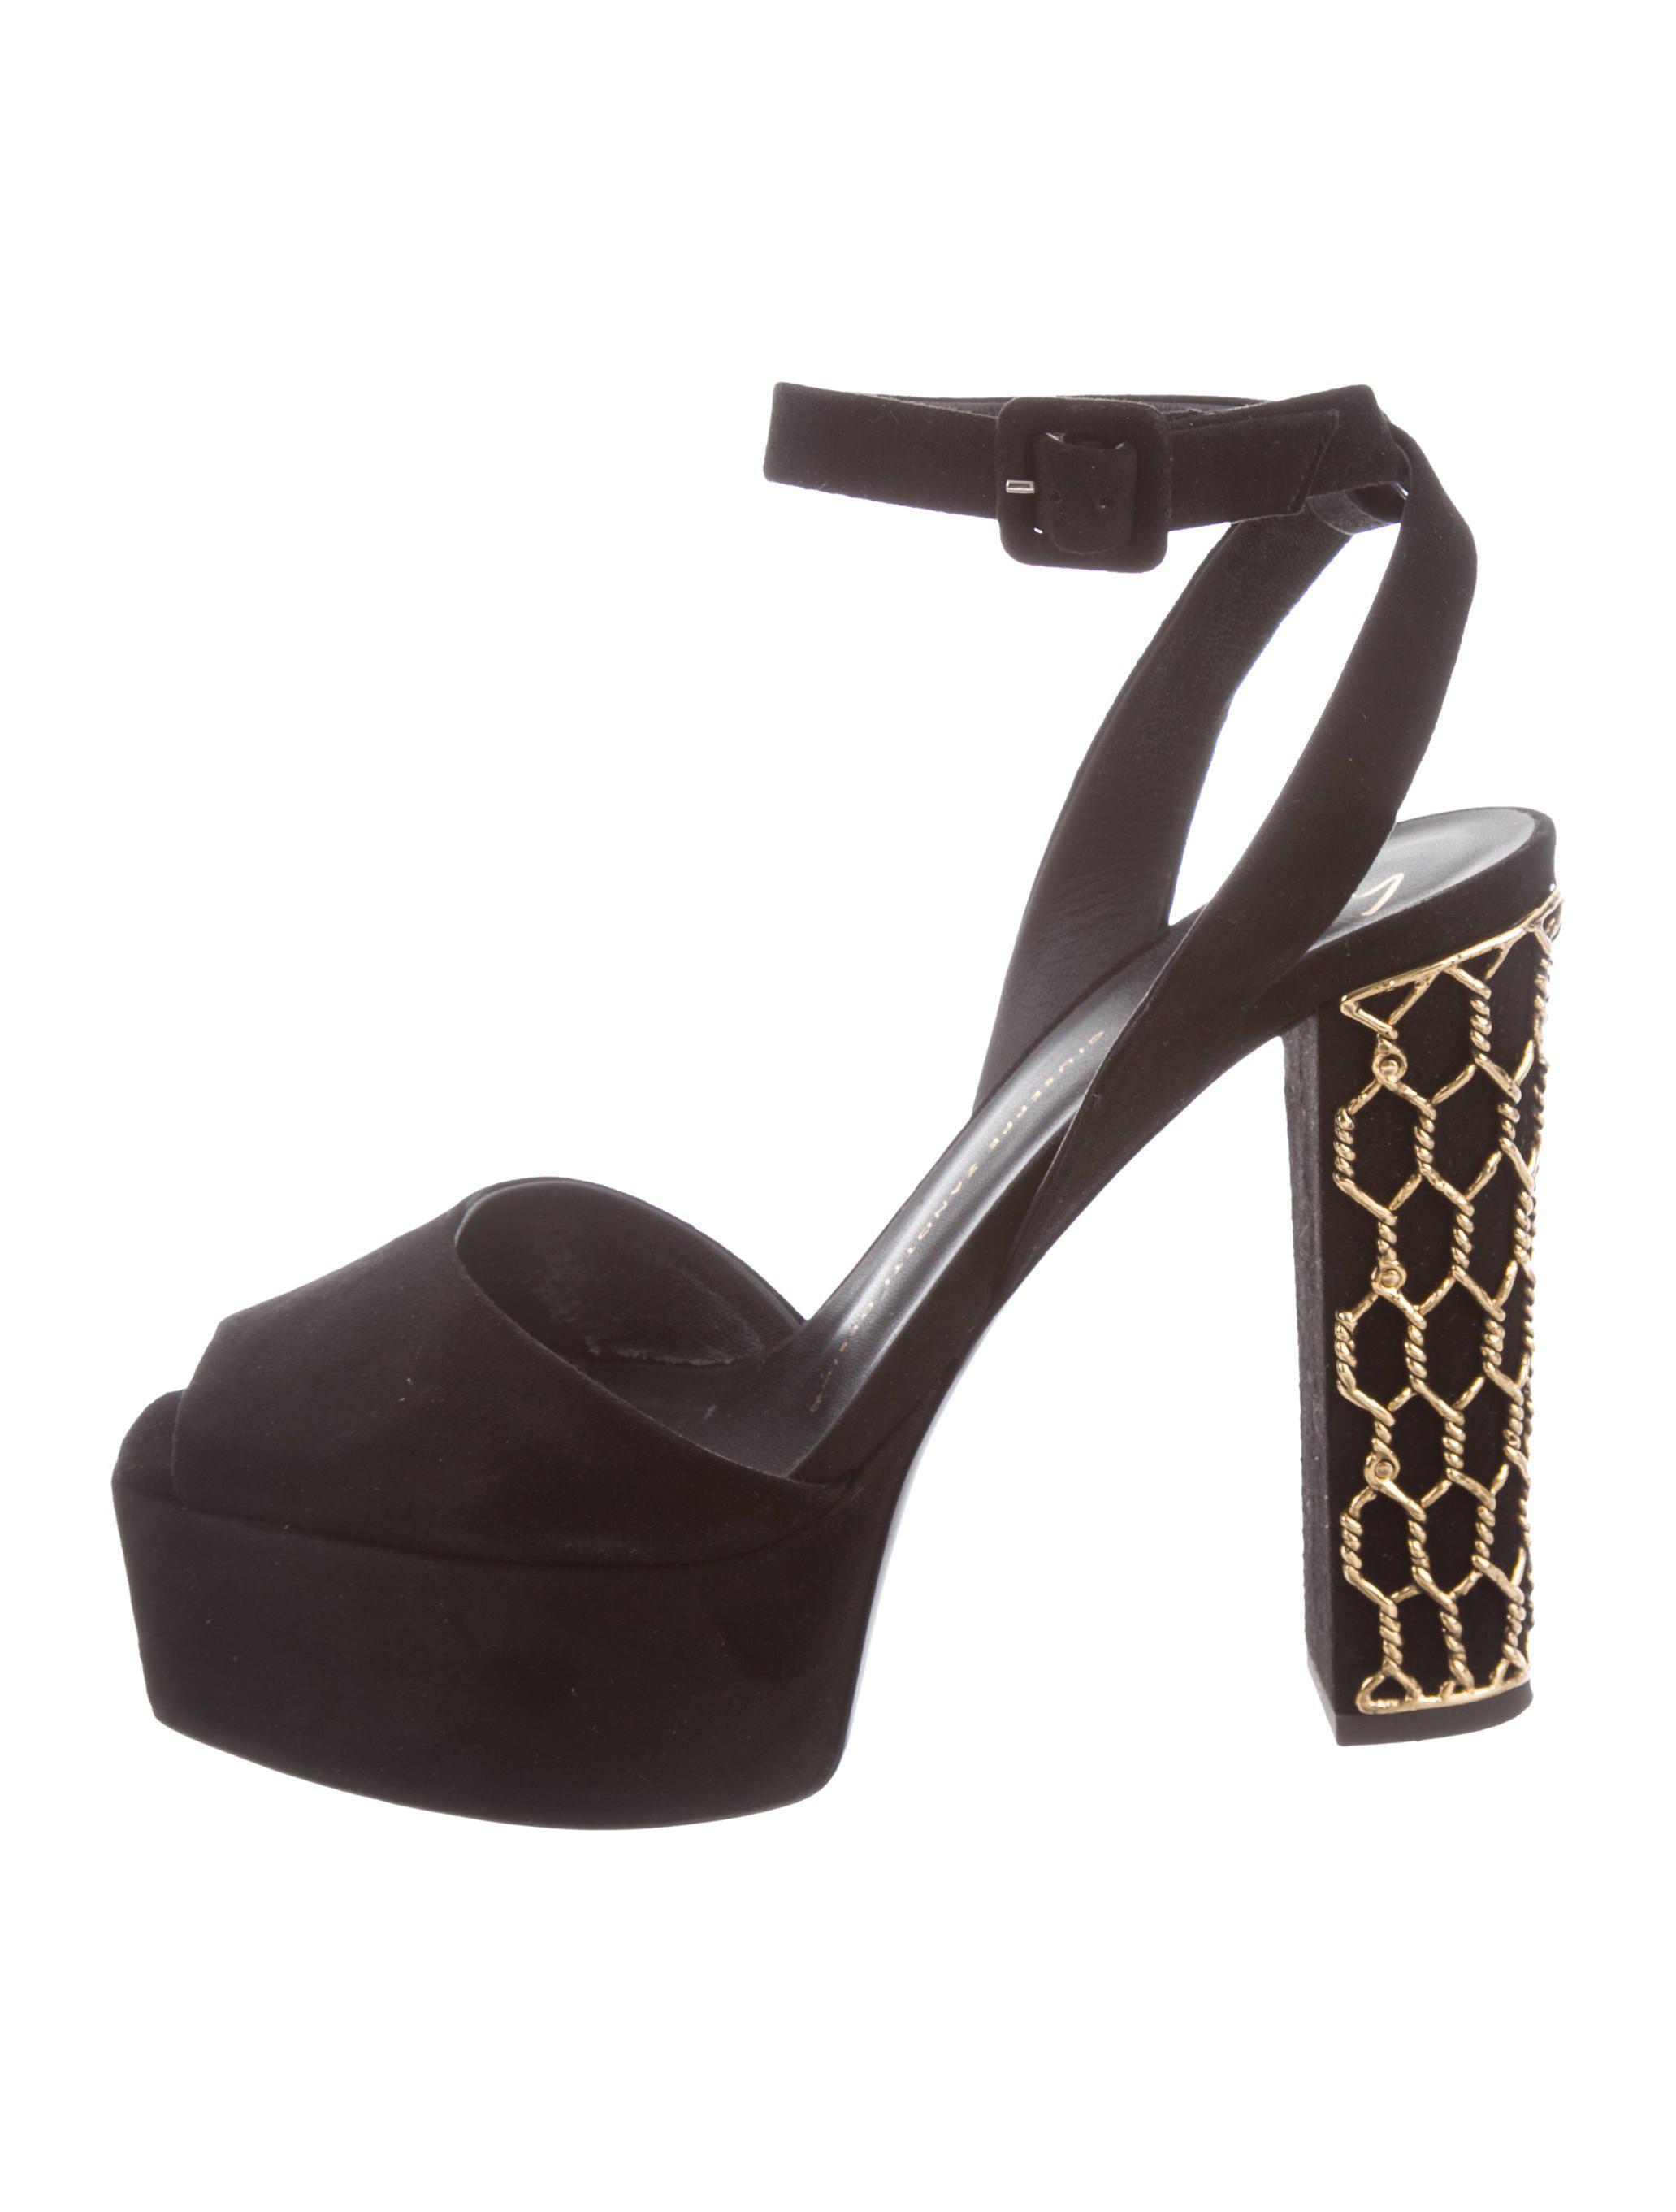 b8fbaad78152 Lyst - Giuseppe Zanotti Embellished Suede Sandals Black in Metallic